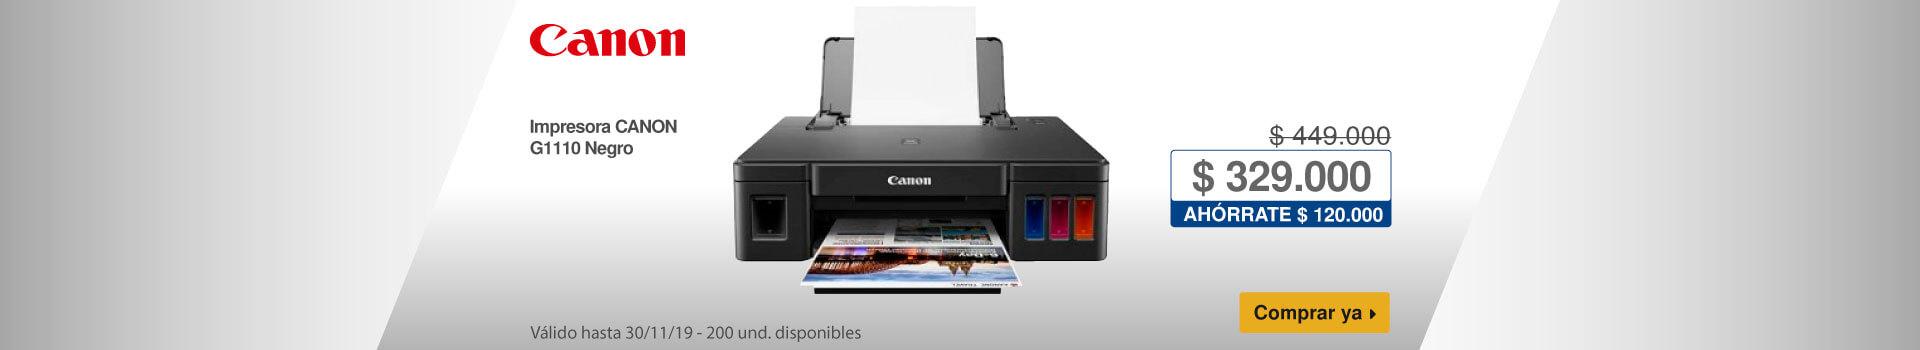 AK-KT-Canon-Impresora-G1110-HgCAT-IMPRIMPRESION09_noviembre